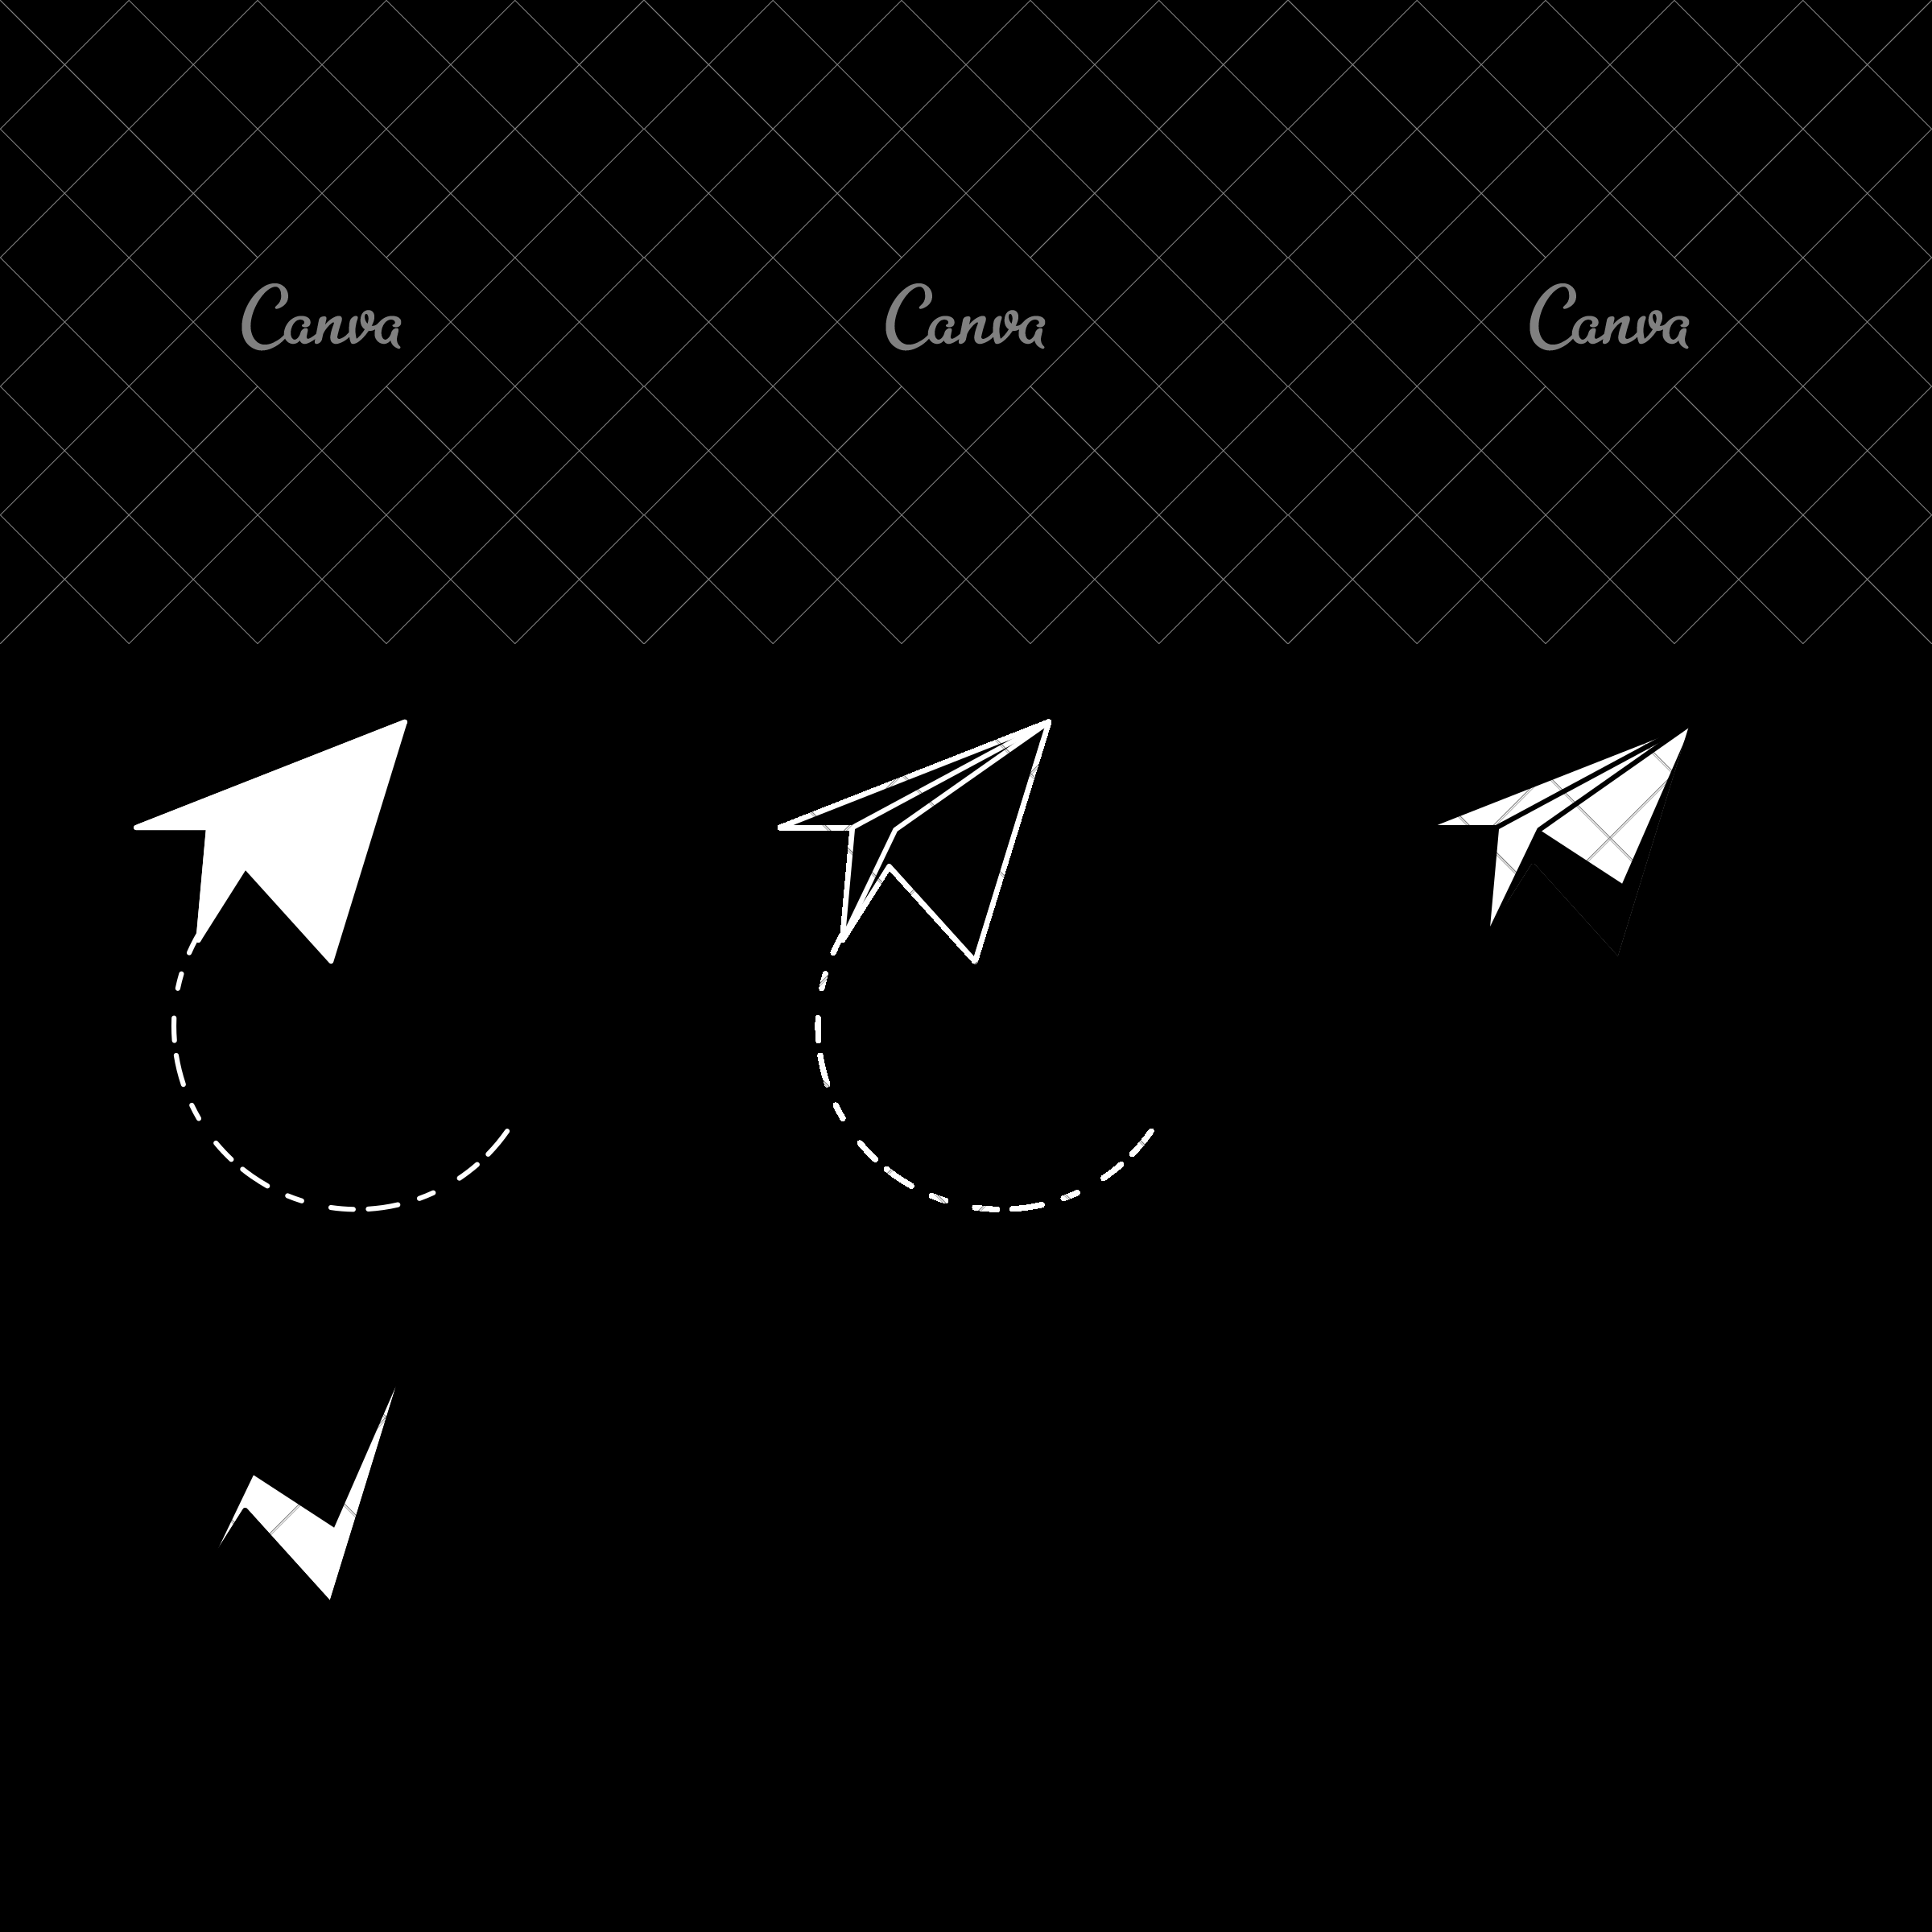 2400x2400 Paper Plane Vector Illustration